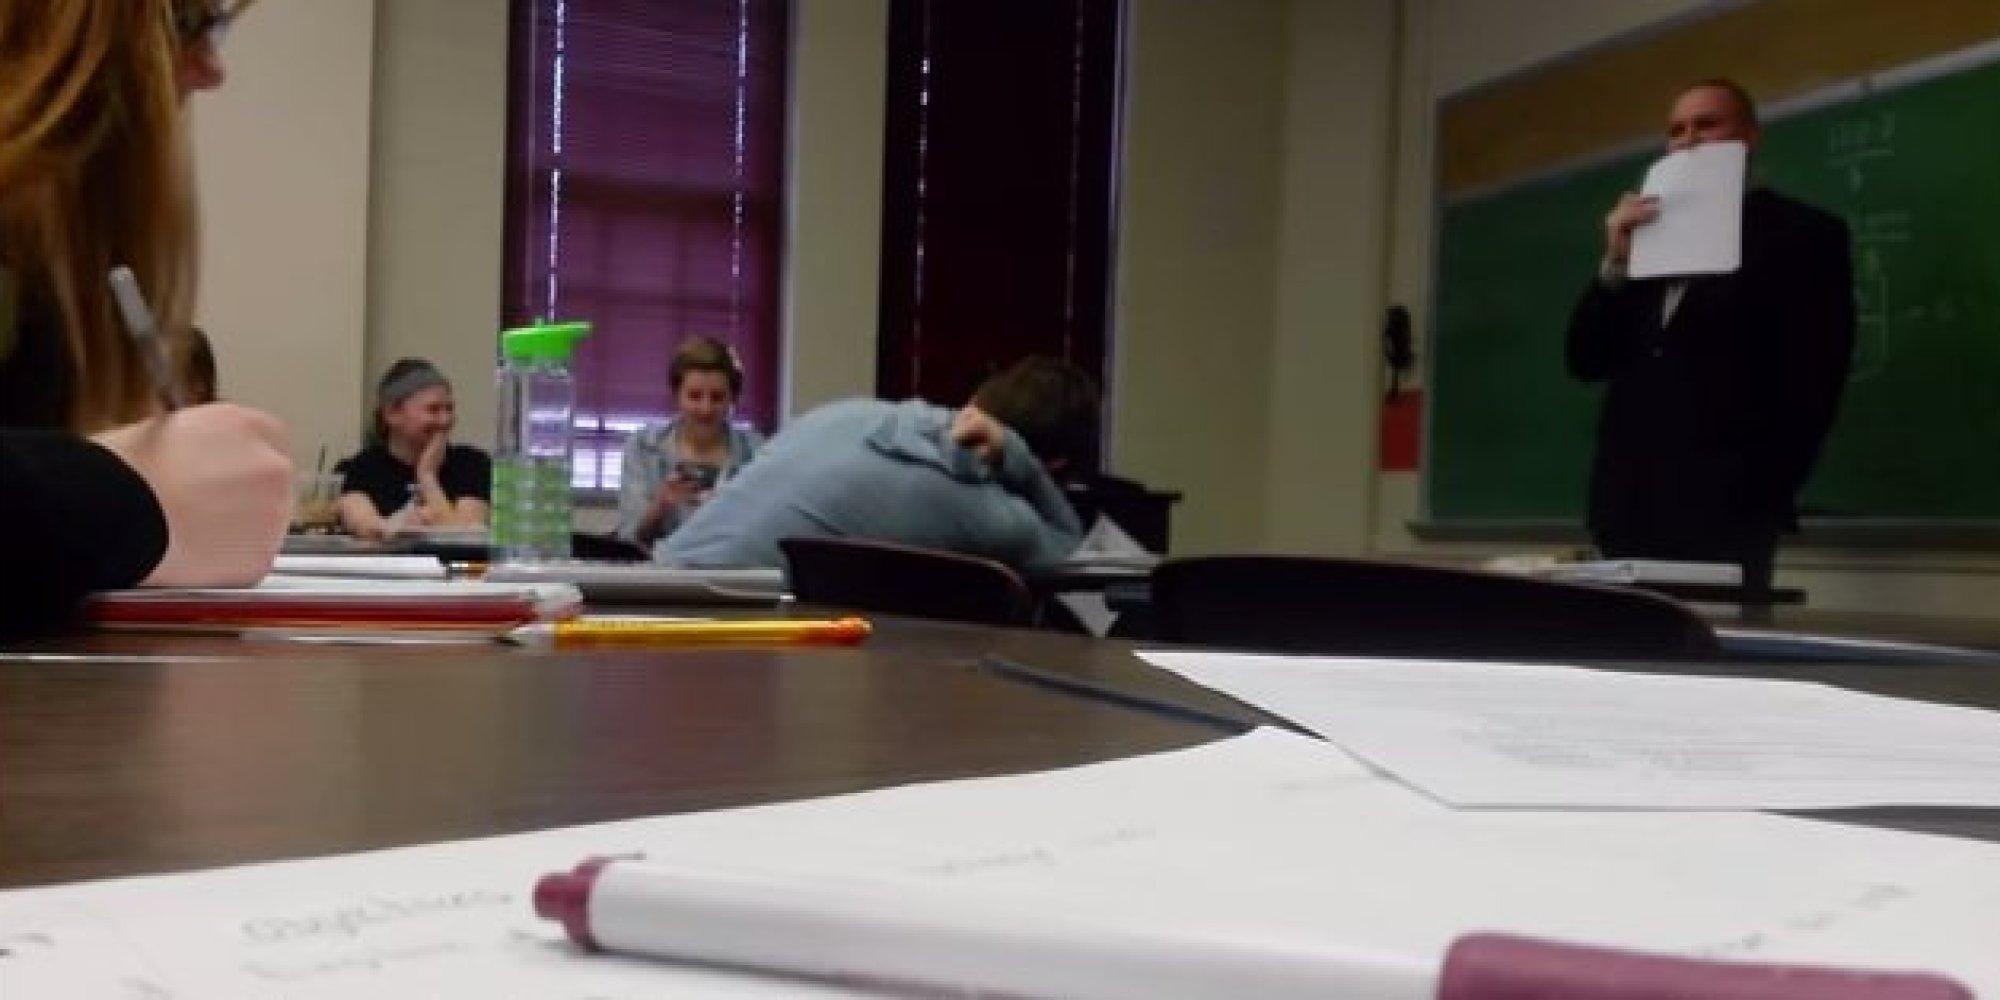 Students' Genius April Fools' Prank On Professor Might Make Him ...